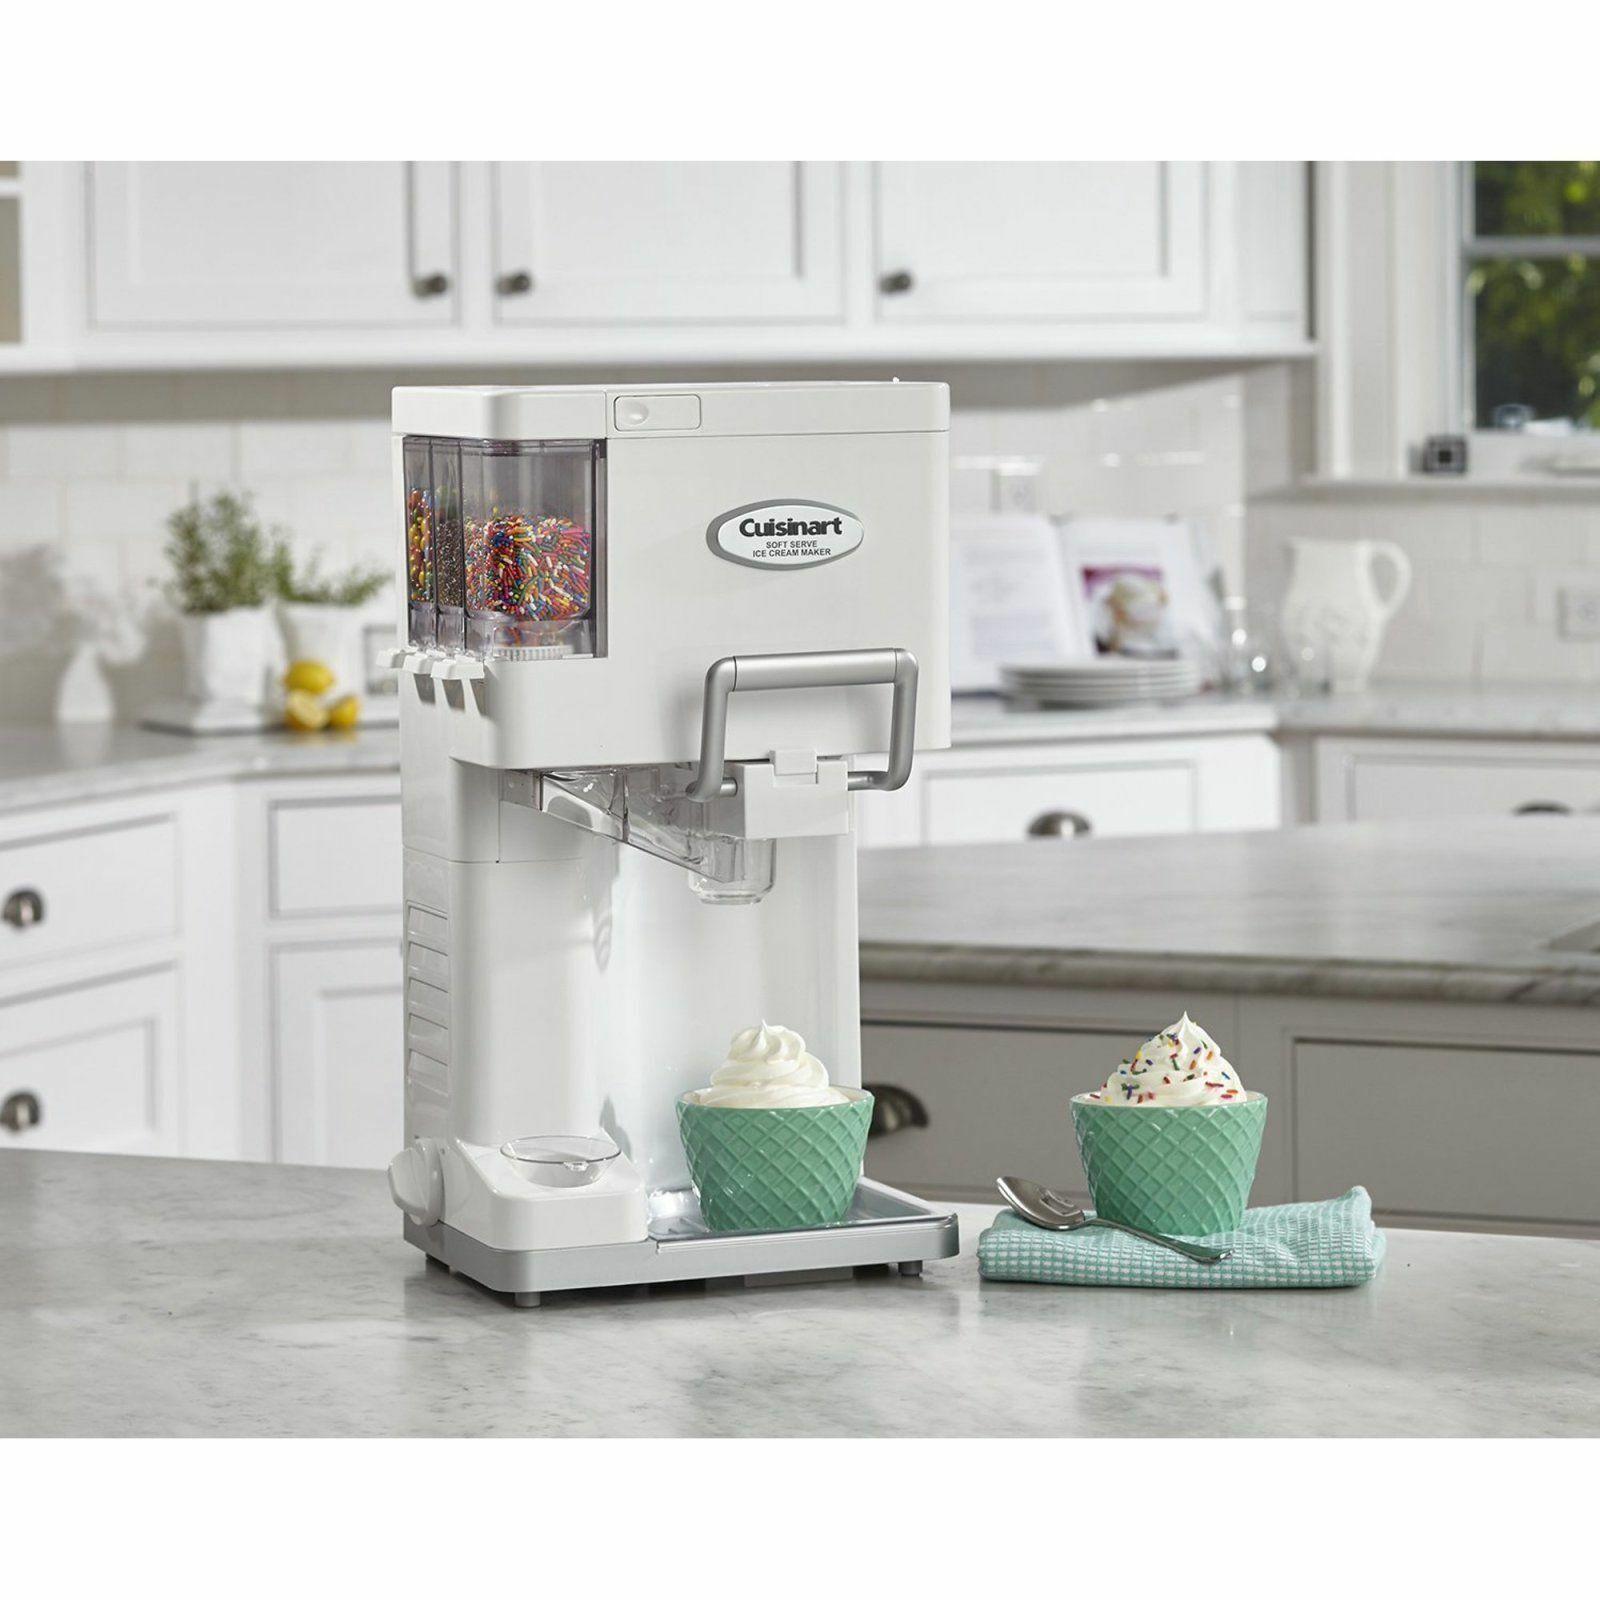 Photo Countertop Soft Serve Ice Cream Machine Maker Yogurt Automatic Freezer Fully